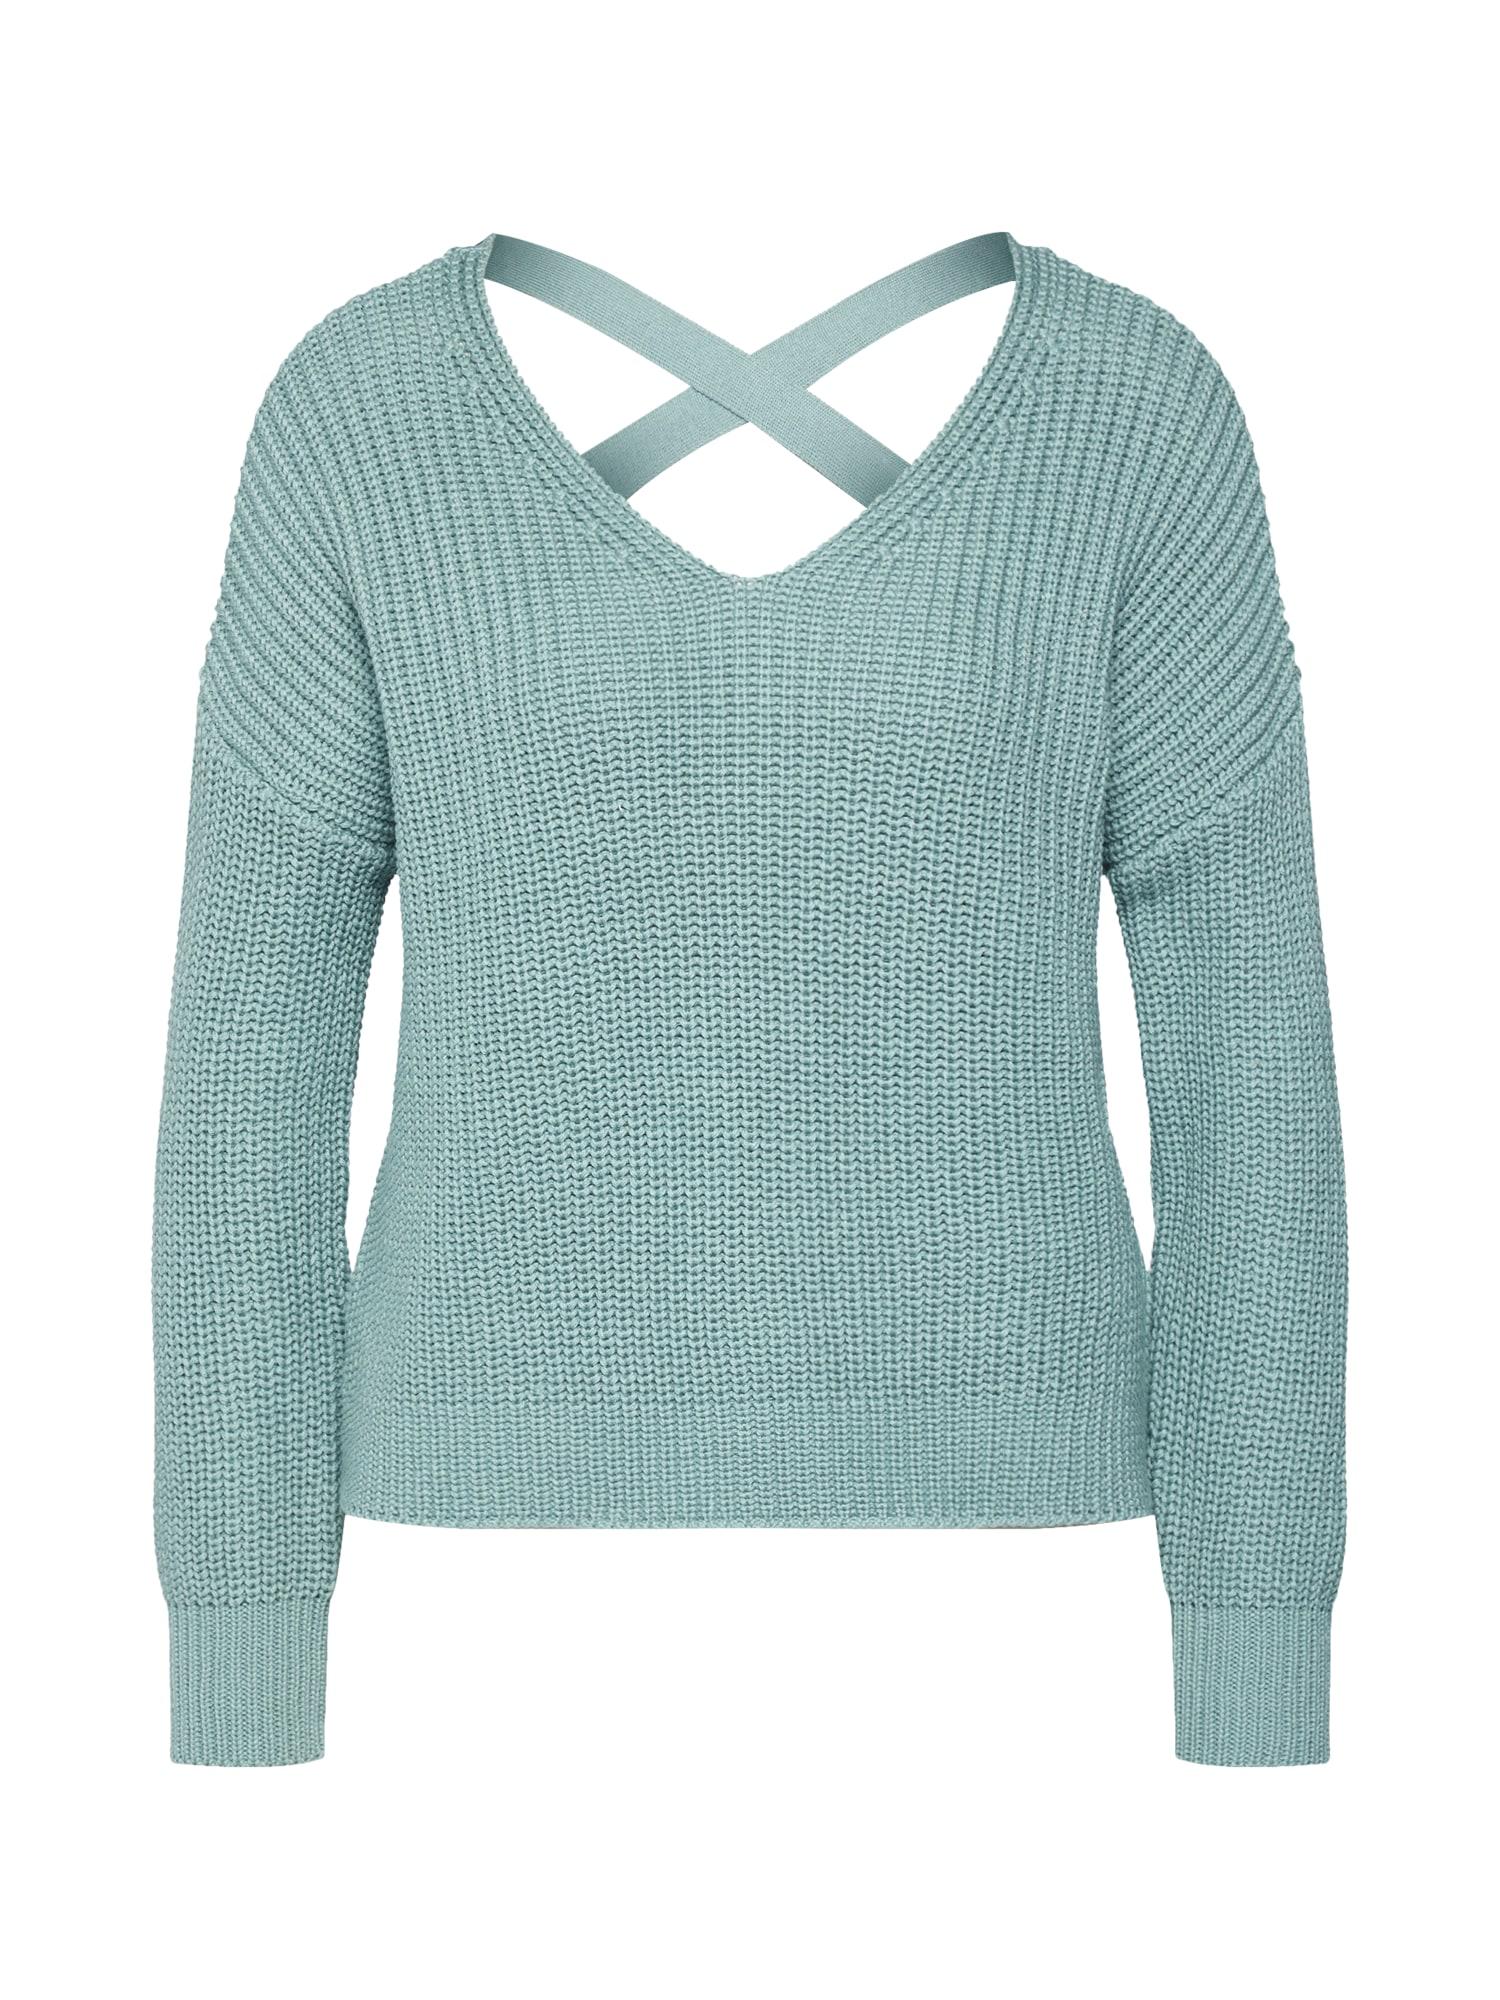 ABOUT YOU Megztinis 'Liliana' žalia